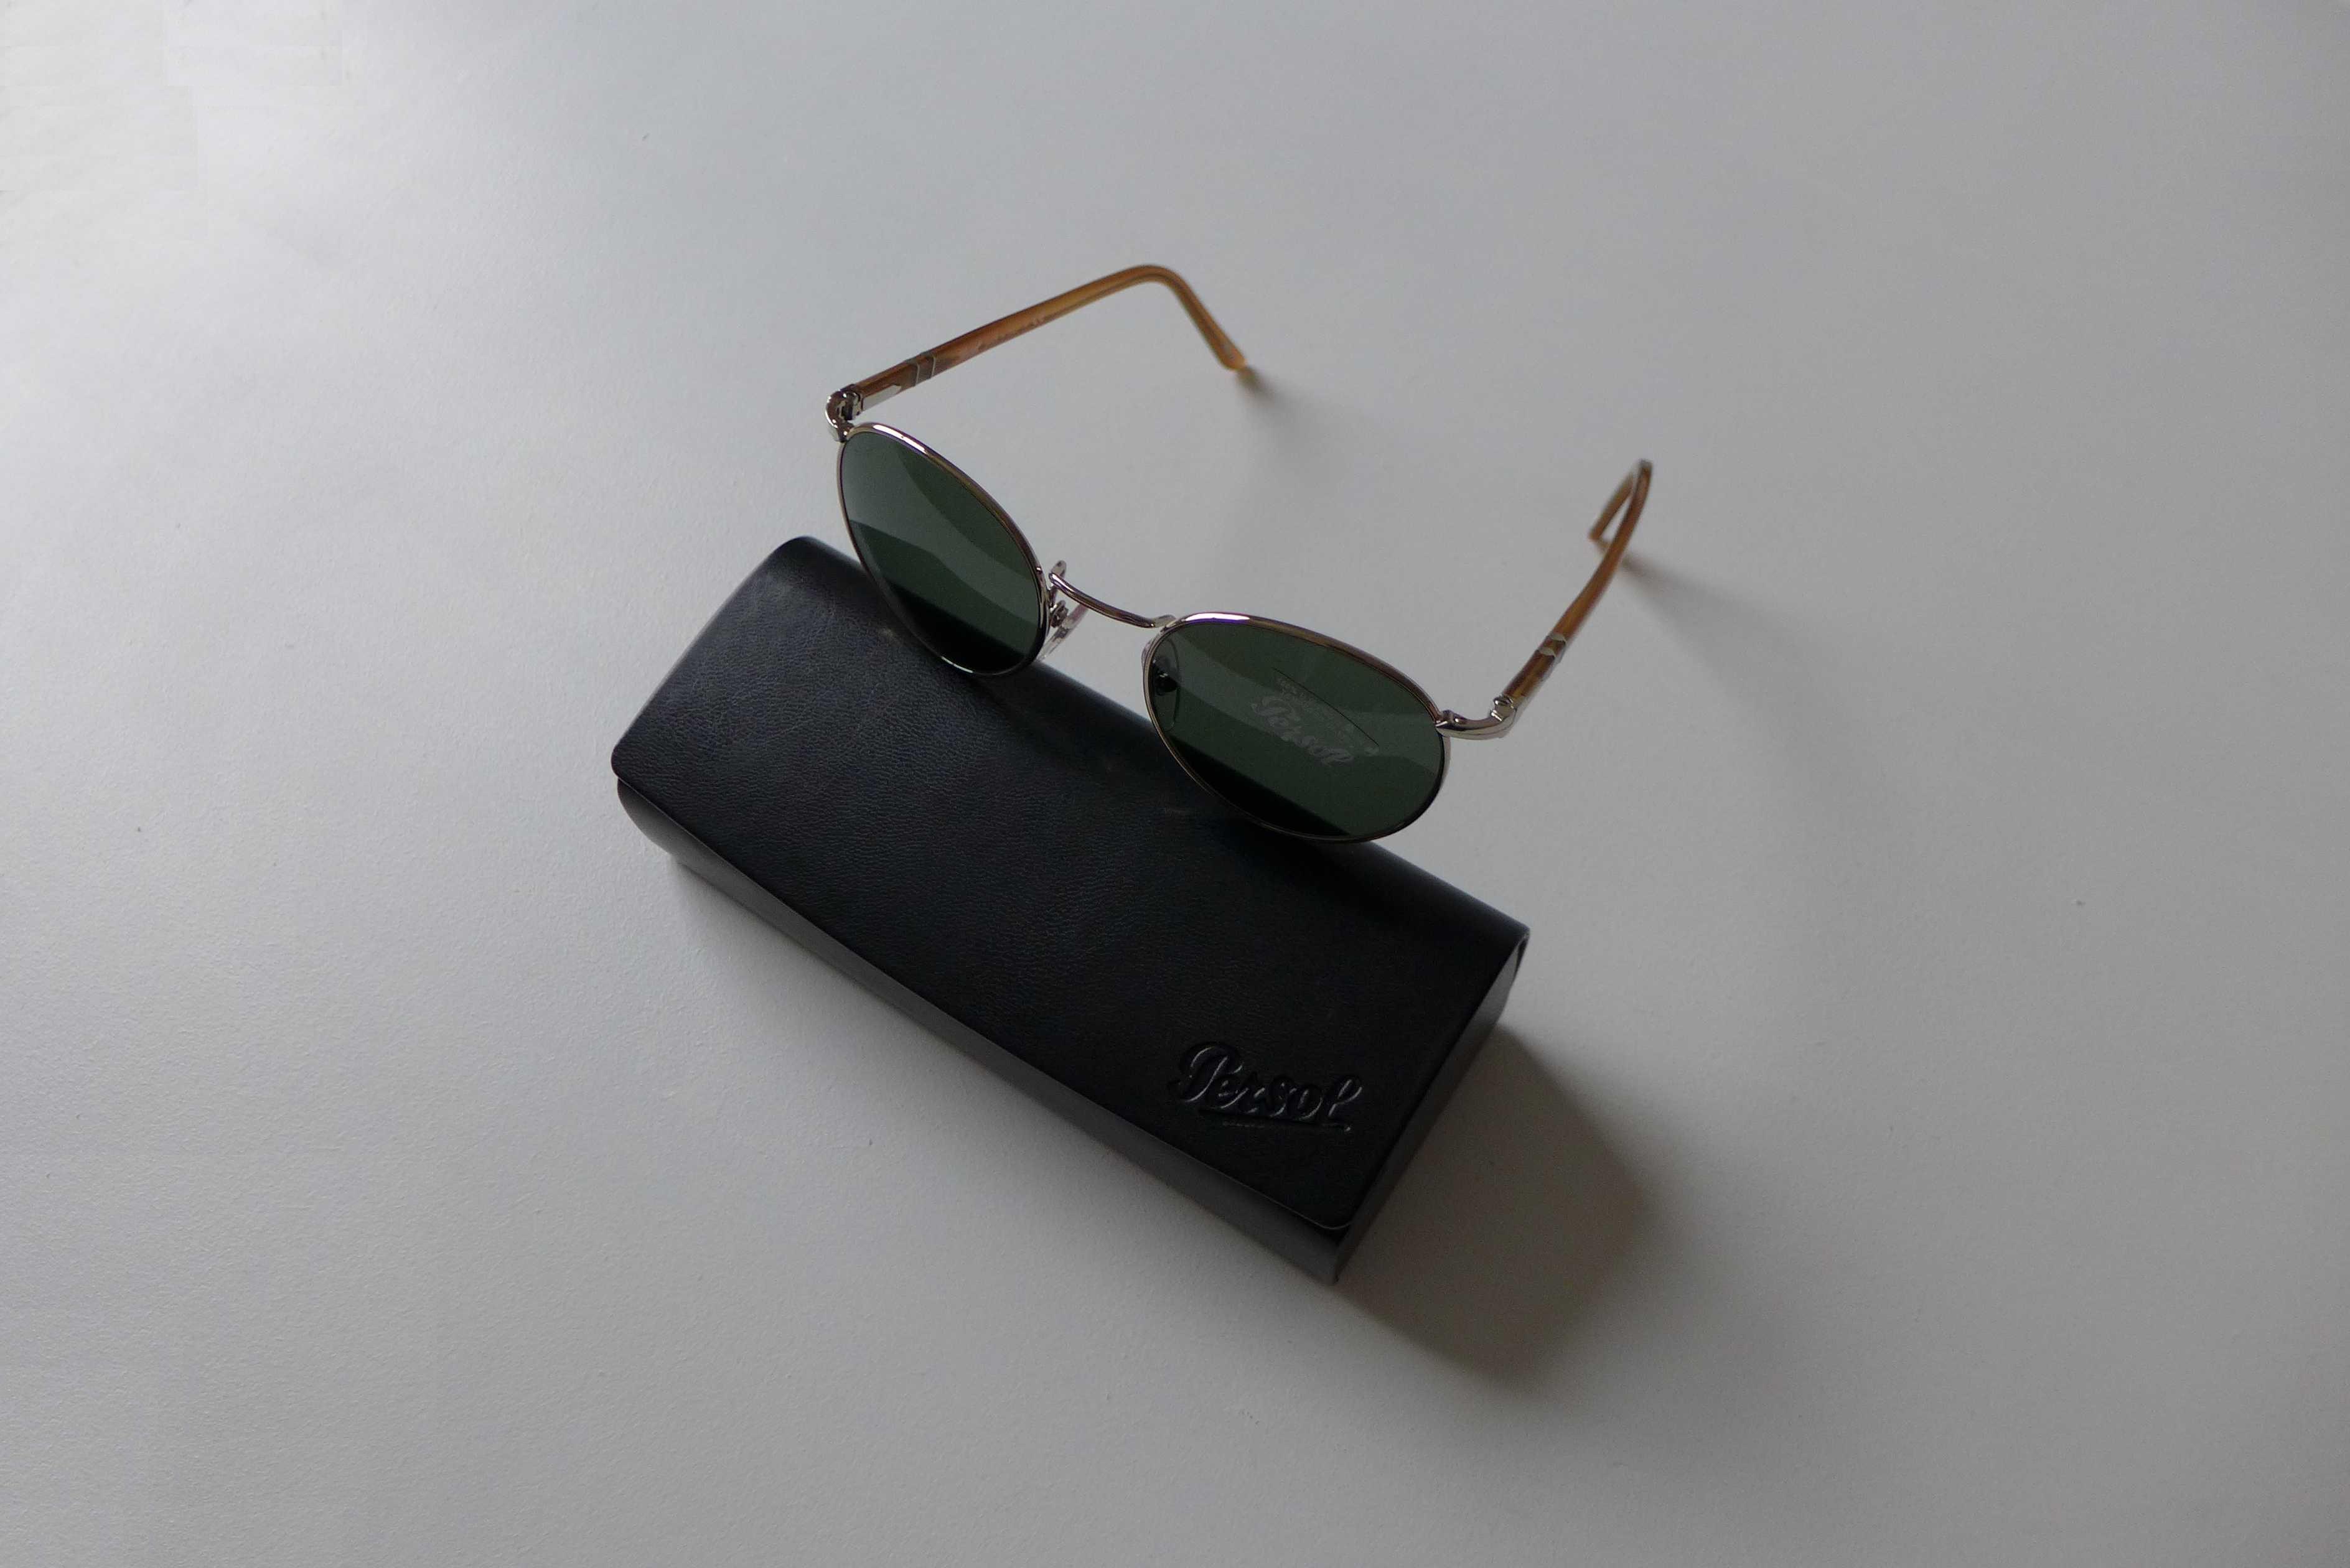 1f49528eeb Persol 2388 Sunglasses - Silver   Tortoiseshell Size one size - Sunglasses  for Sale - Grailed